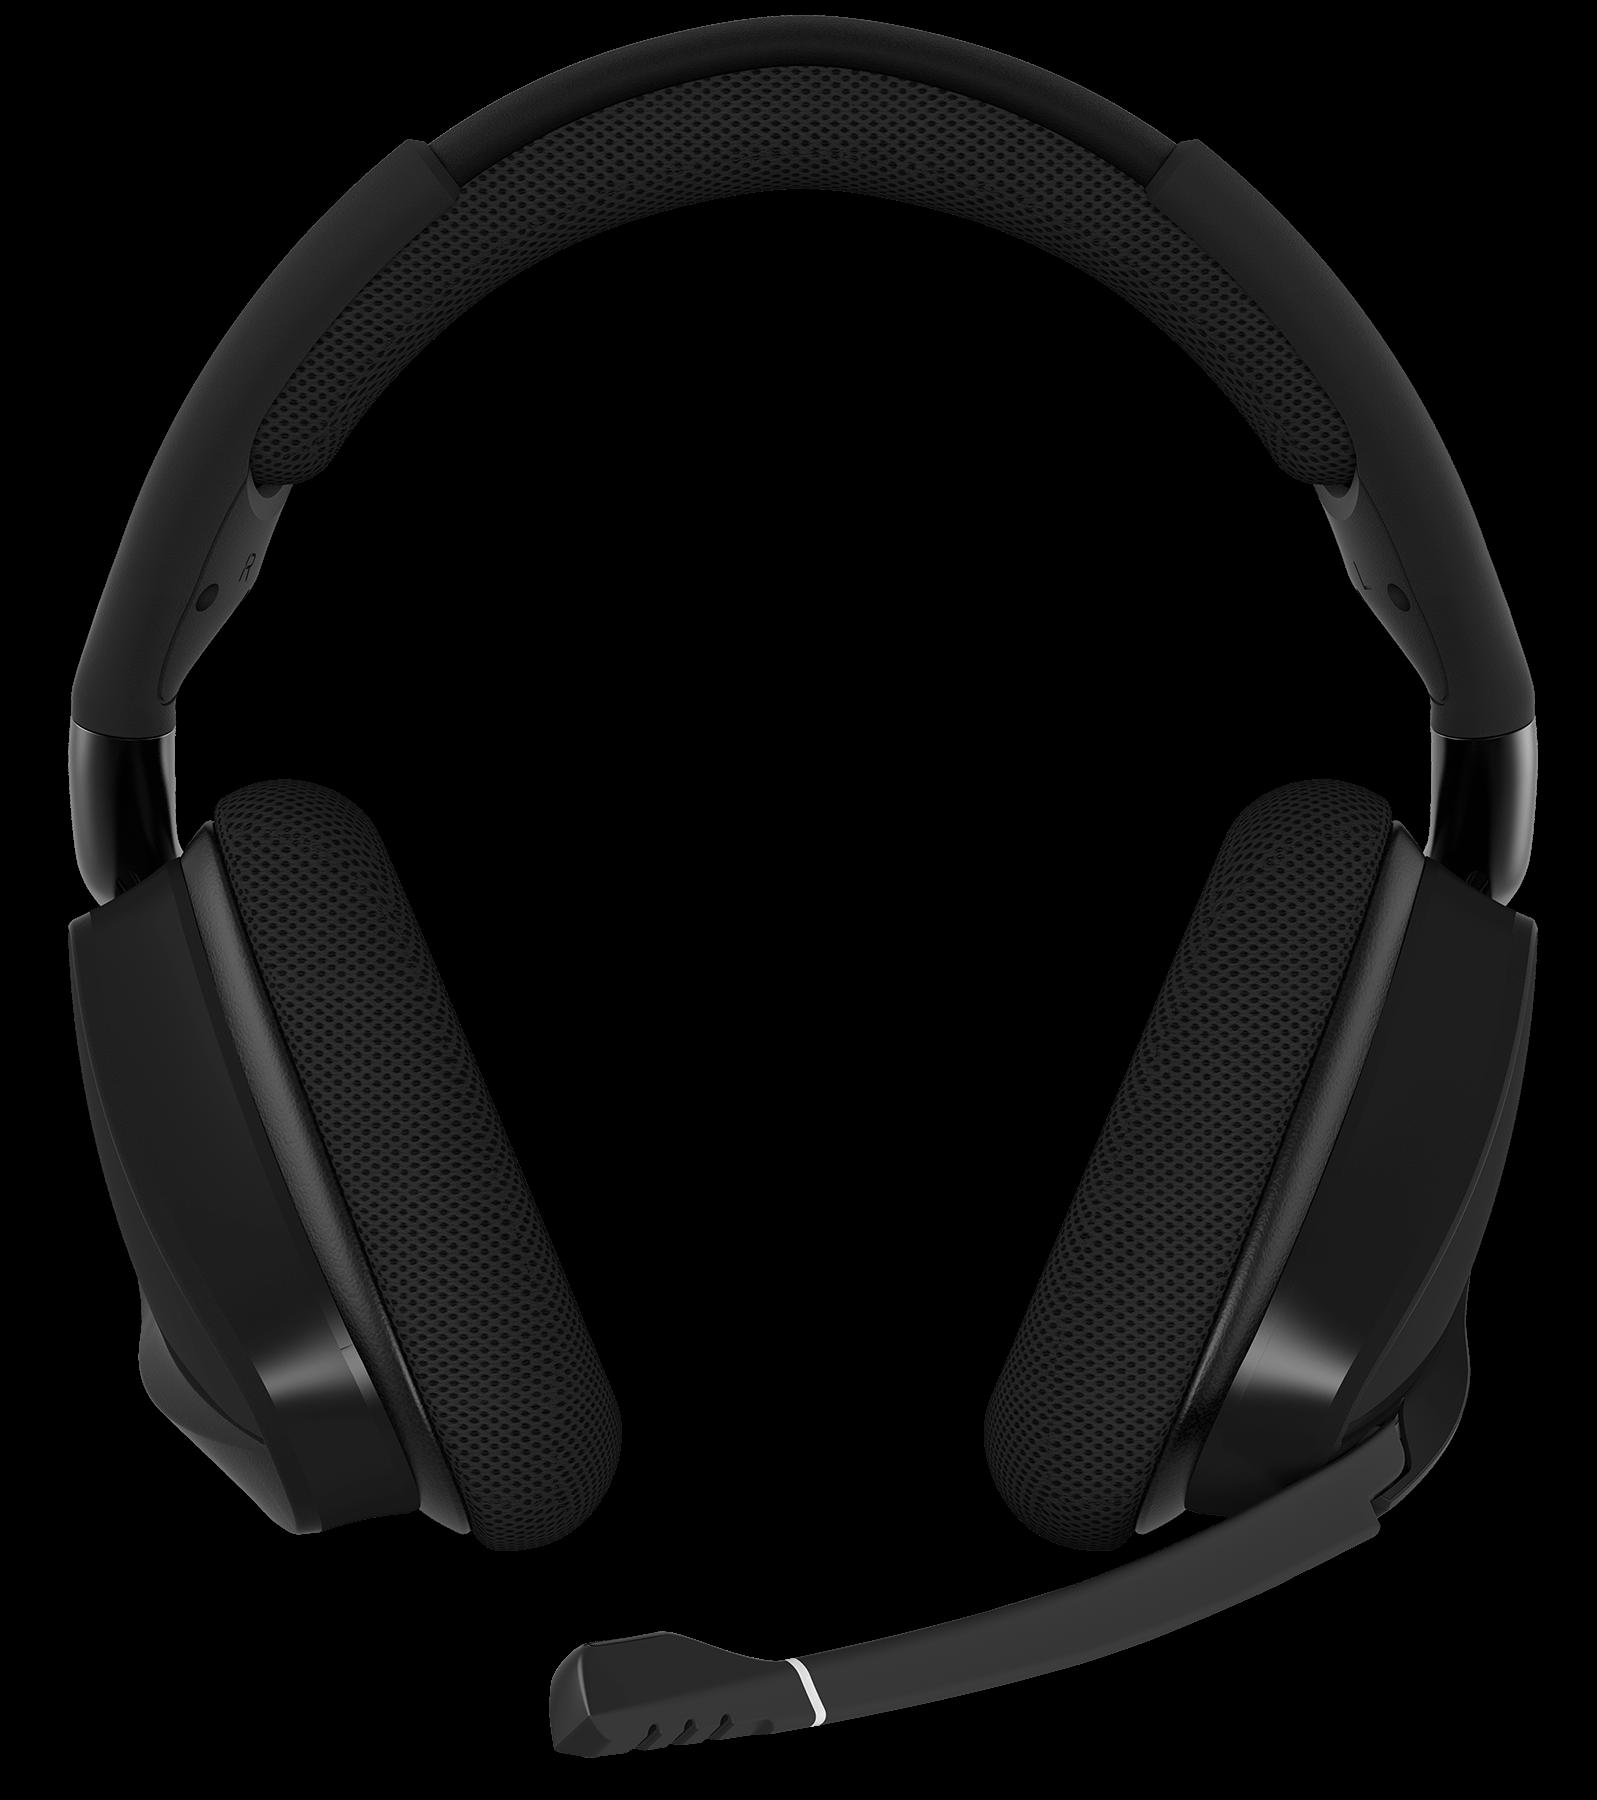 Corsair void pro rgb. Headphones clipart sound bar